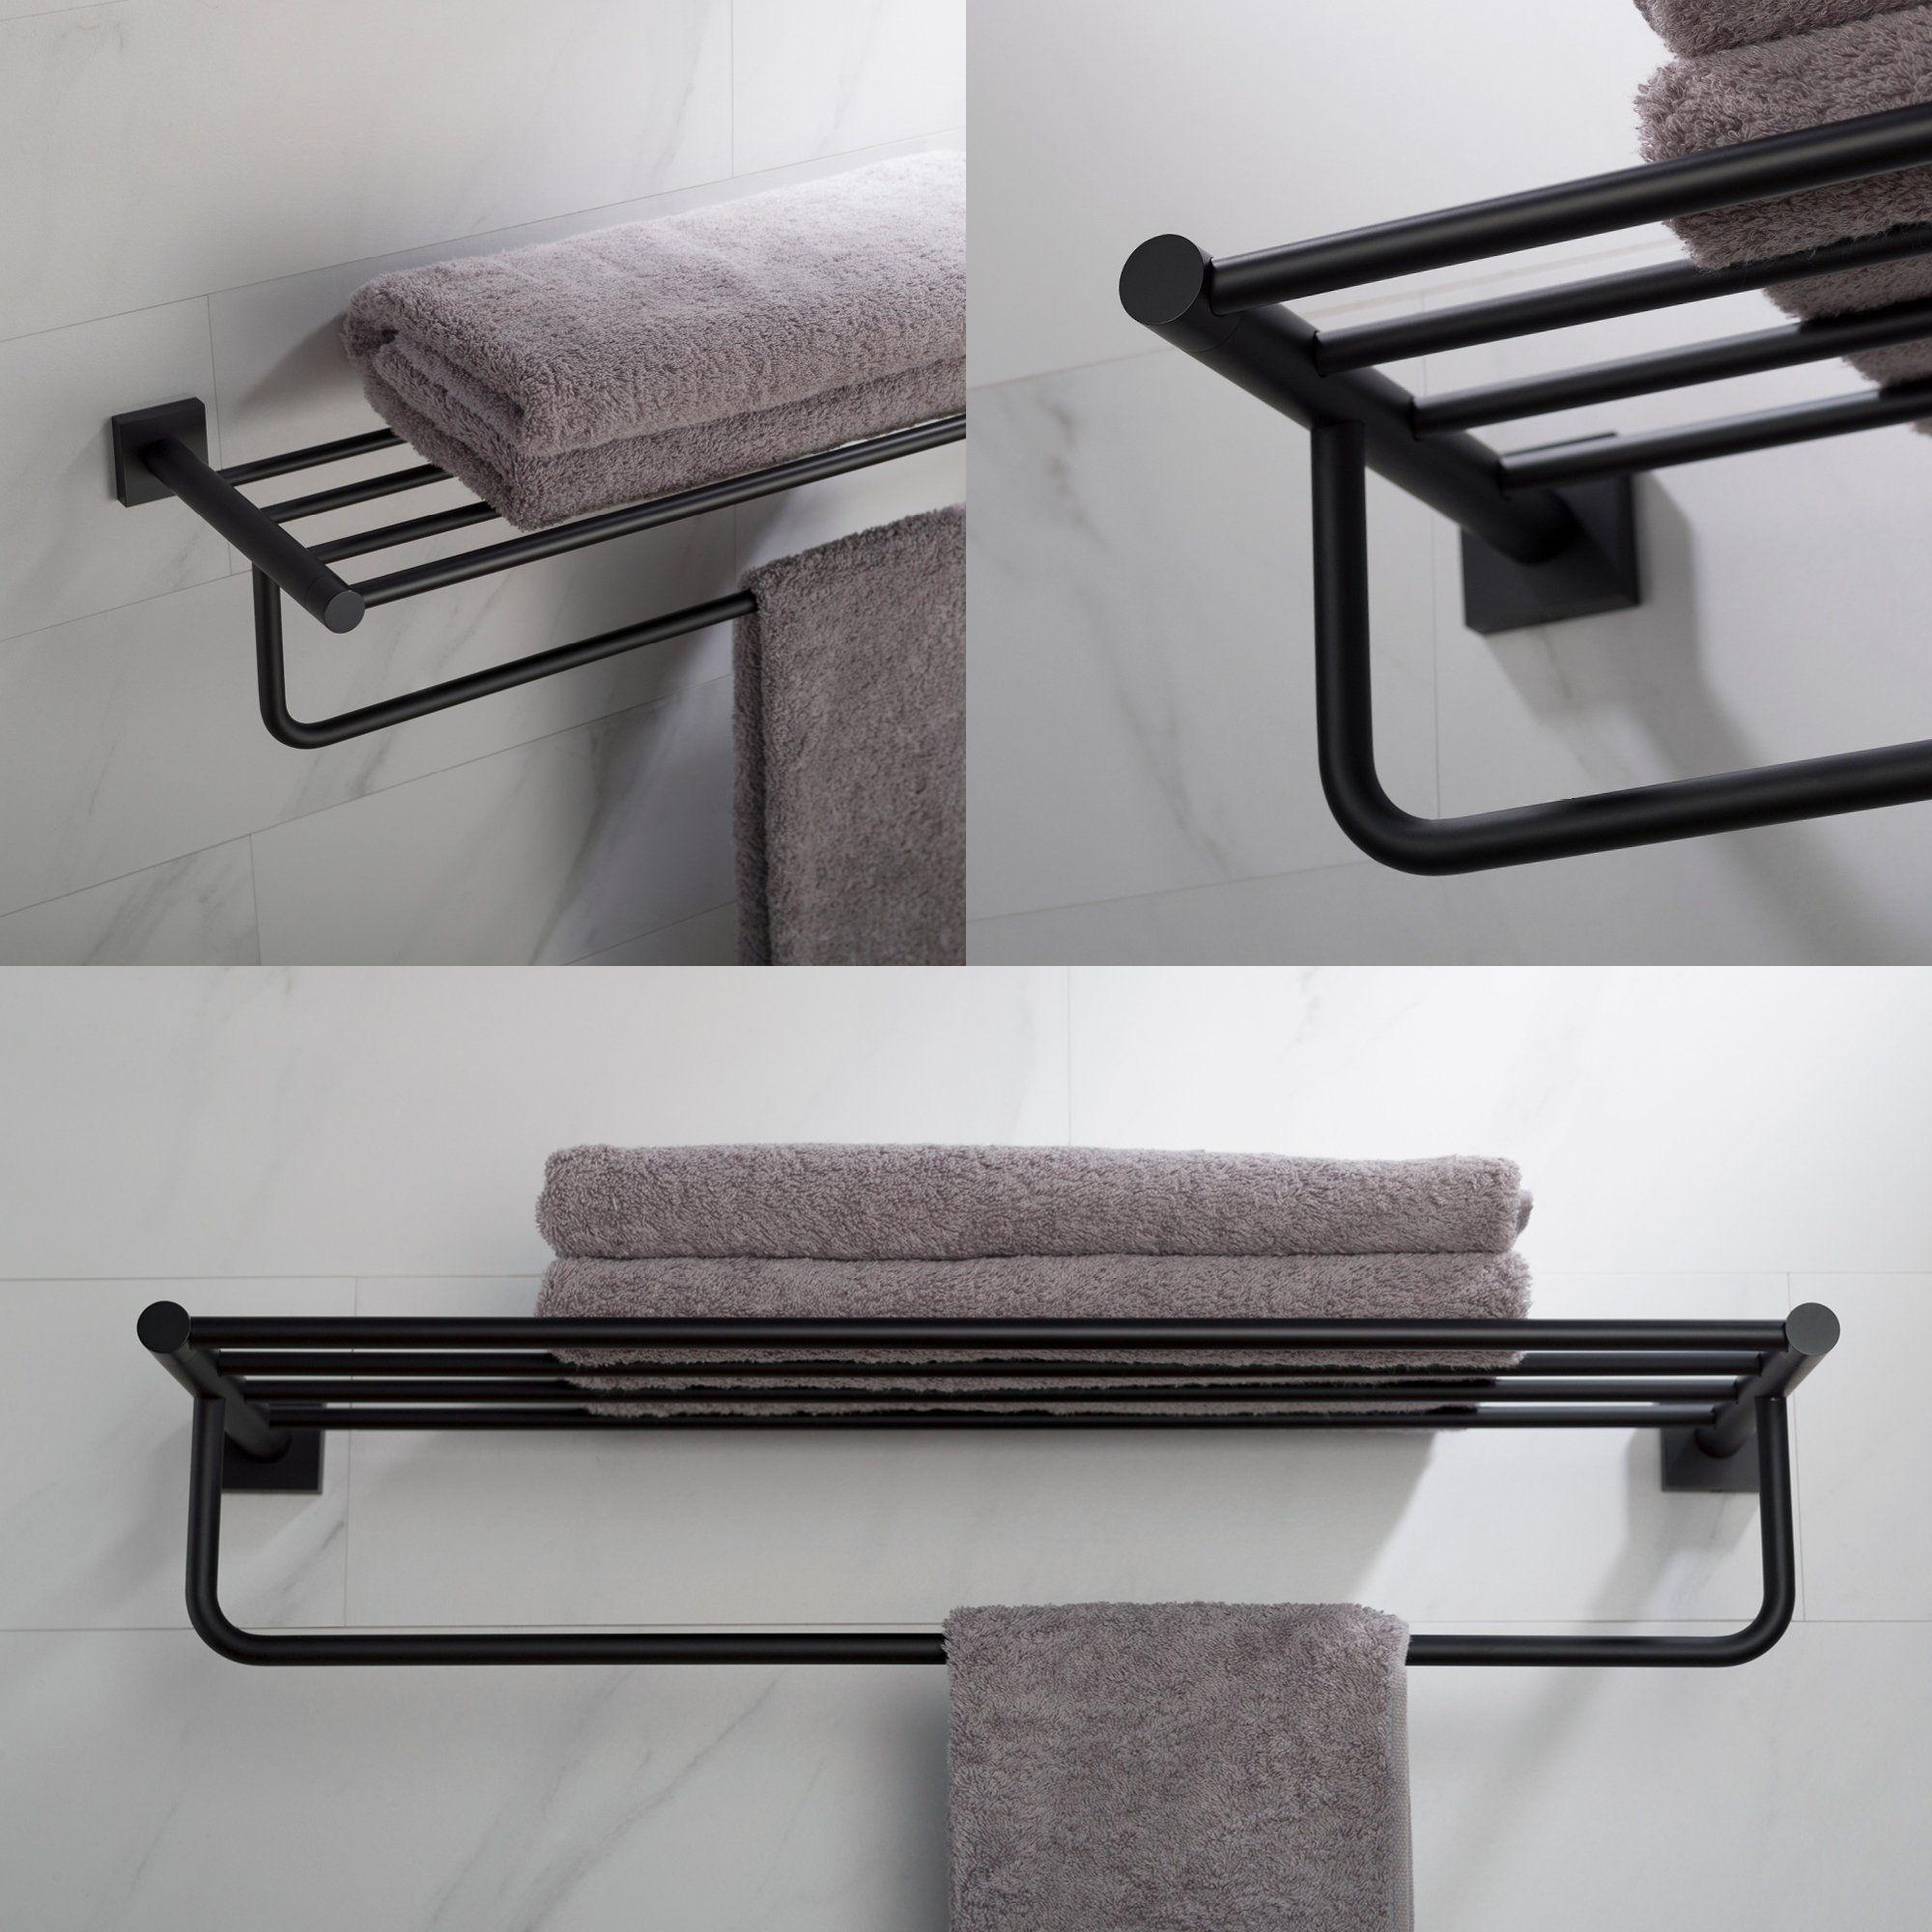 Kraus Ventus Kea 17742 Bathroom Shelf With Towel Bar In Chrome Brushed Nickel Matte Black Finish Matte Matte Black Towel Rack Towel Bar Black Towels